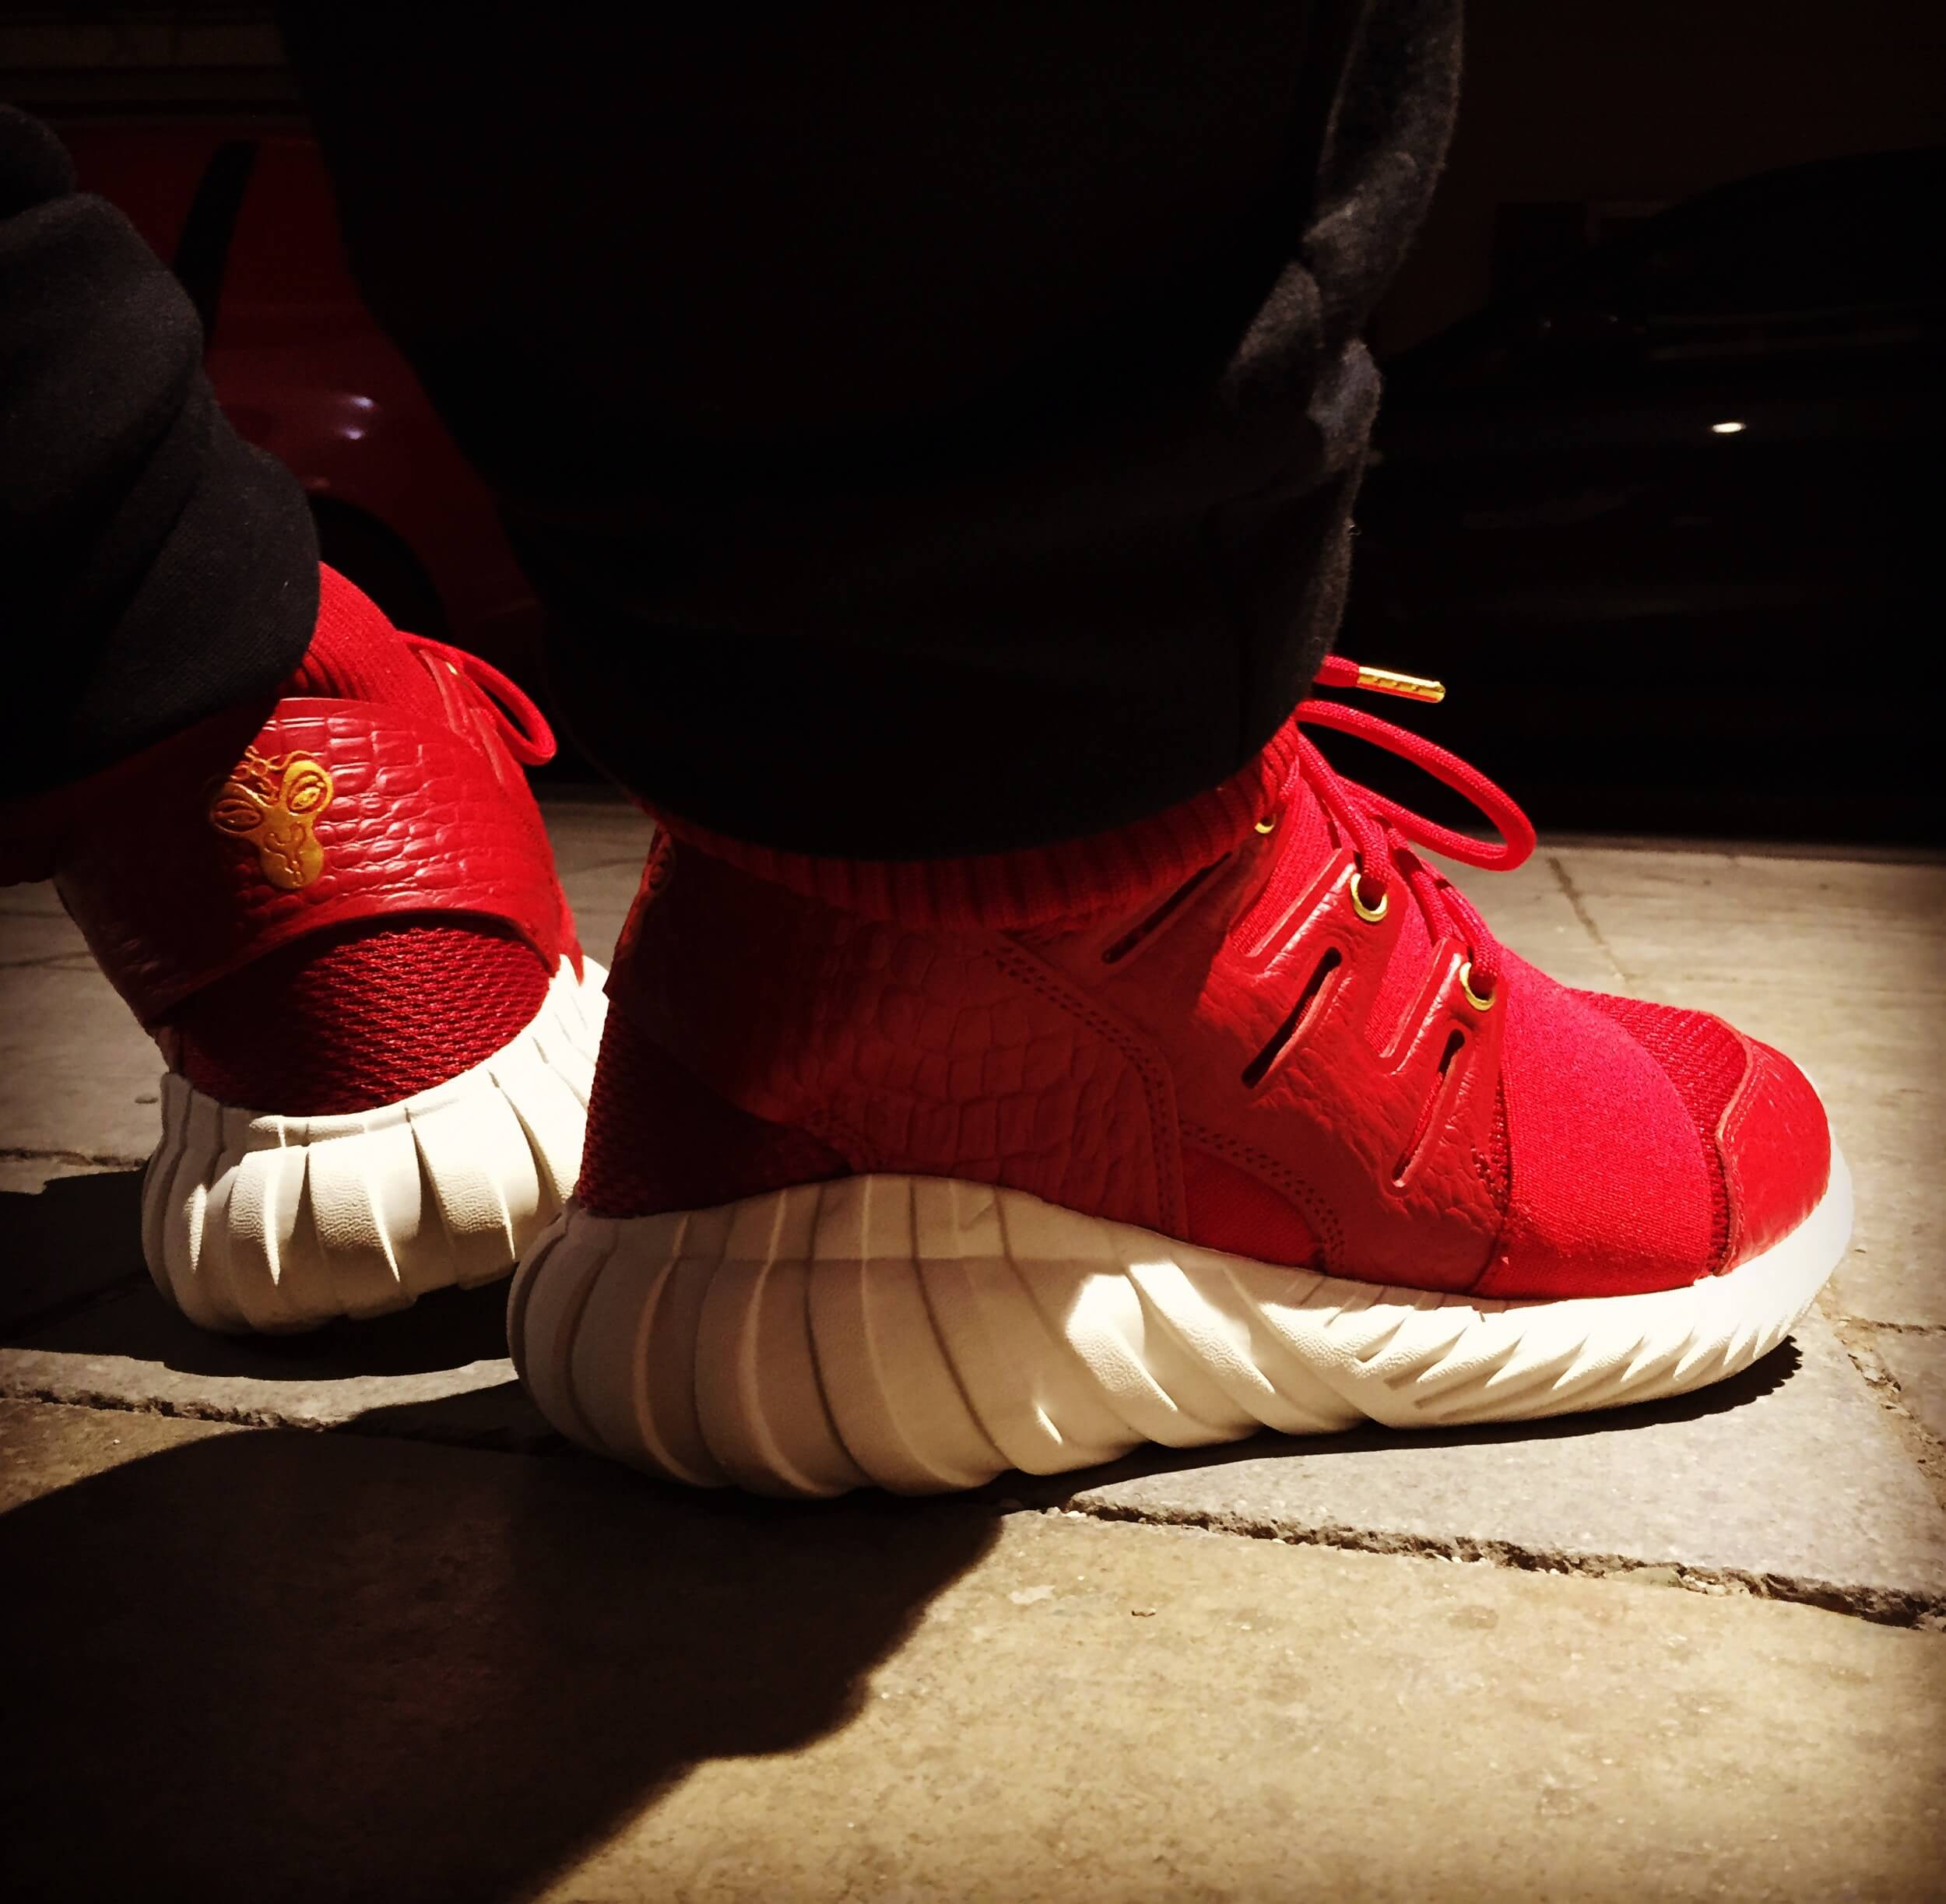 Adidas-Tubular-Doom-Chinese-New-Year-Rear-View-Benstah-Onfeet